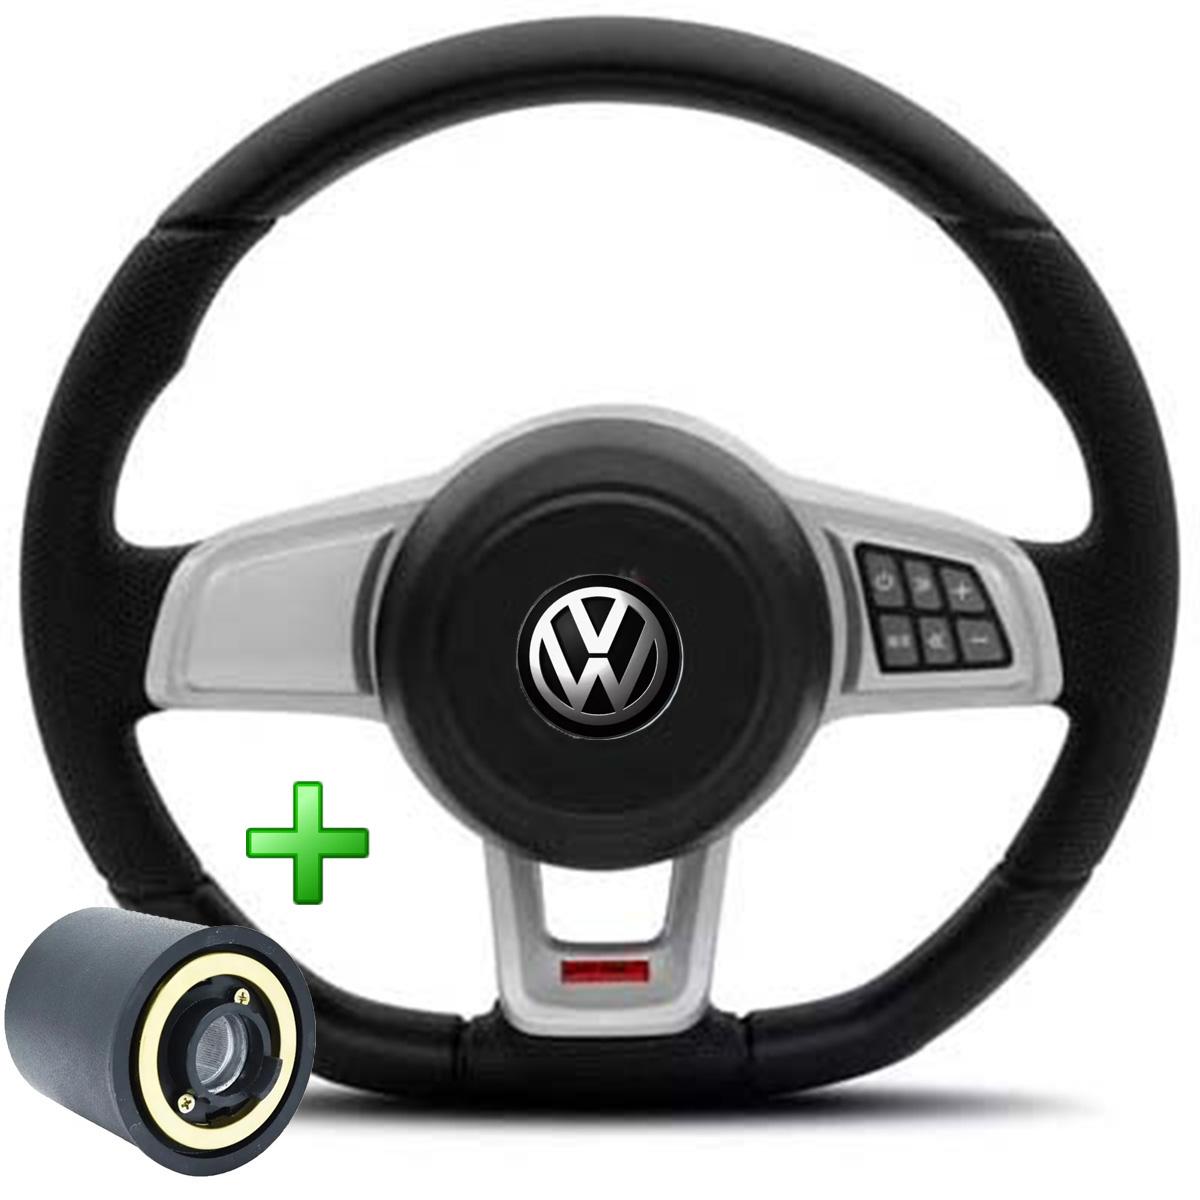 Volante Com Comando Volkswagen Mk7 Esportivo Cubo Golf Saveiro Voyage Parati Poliparts